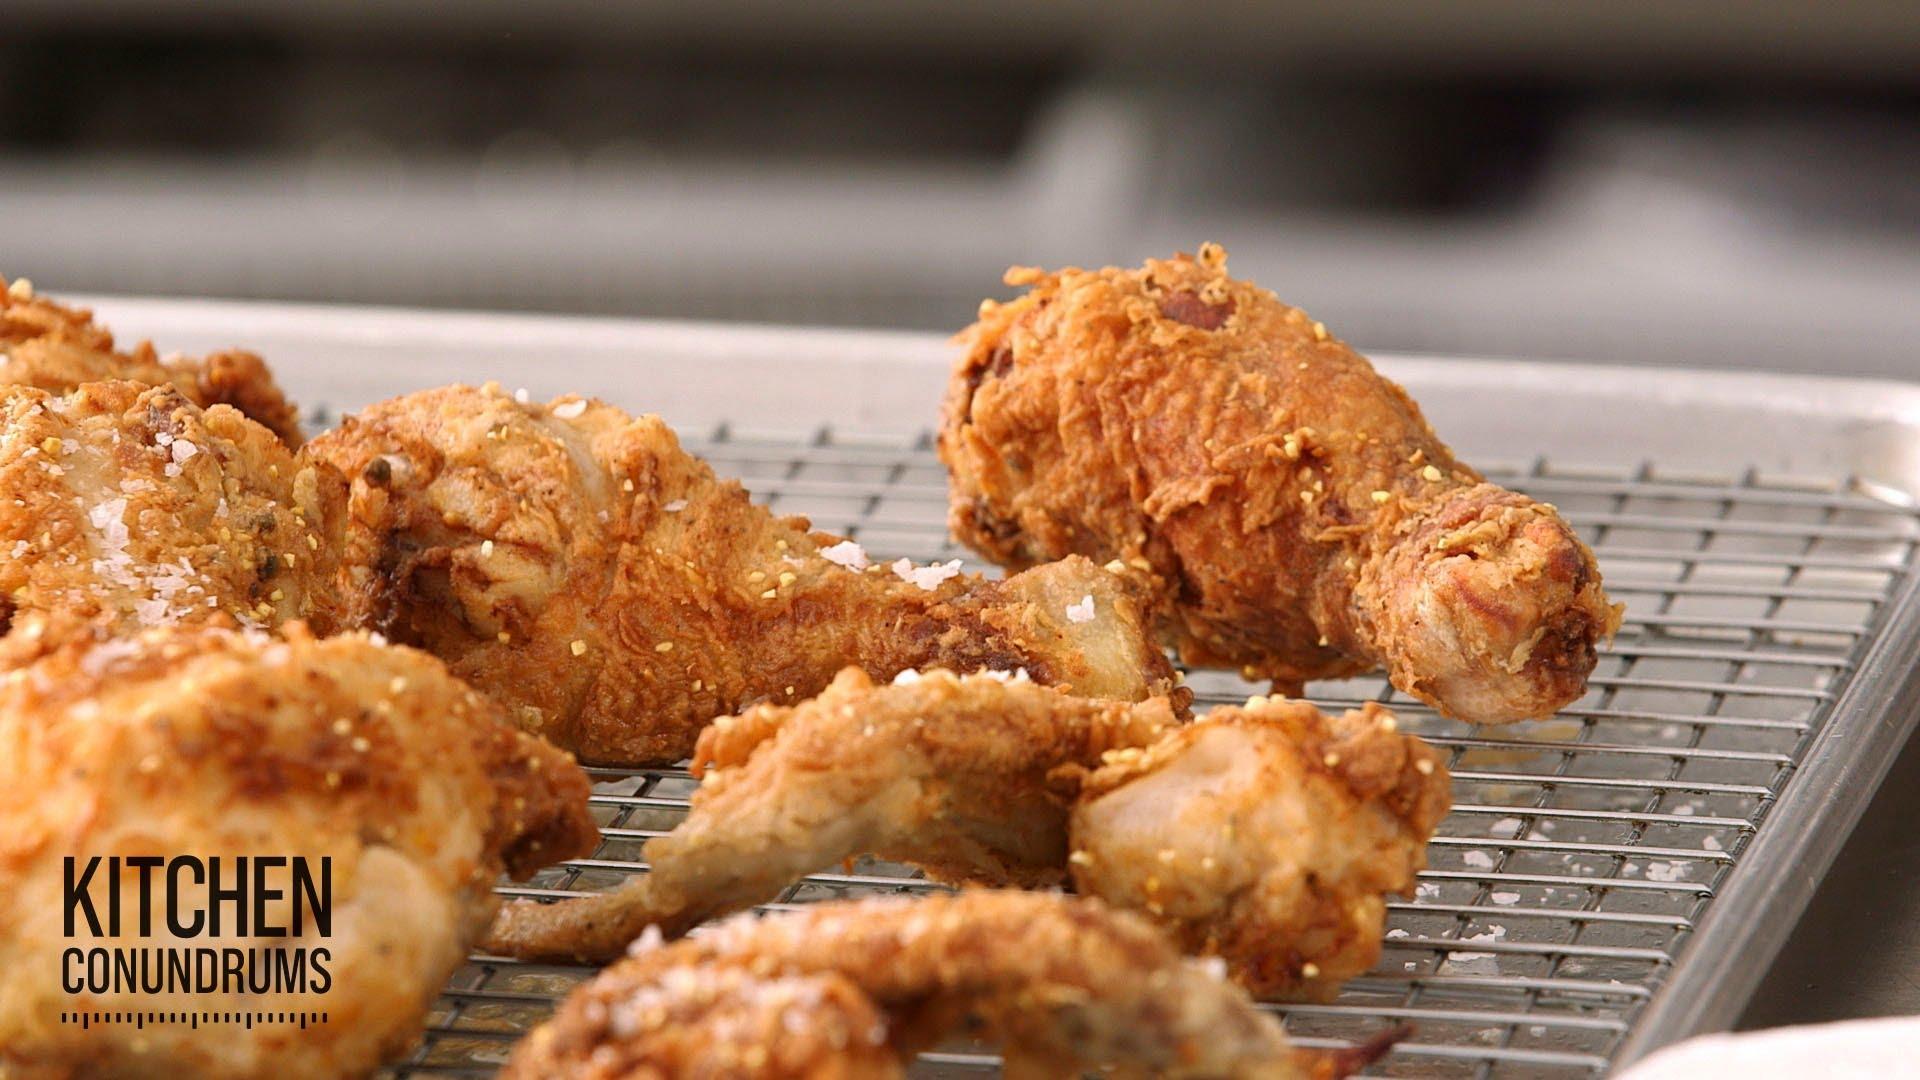 FRIDAY NIGHT!!! 為您送上讓人無法抵抗的炸雞食譜